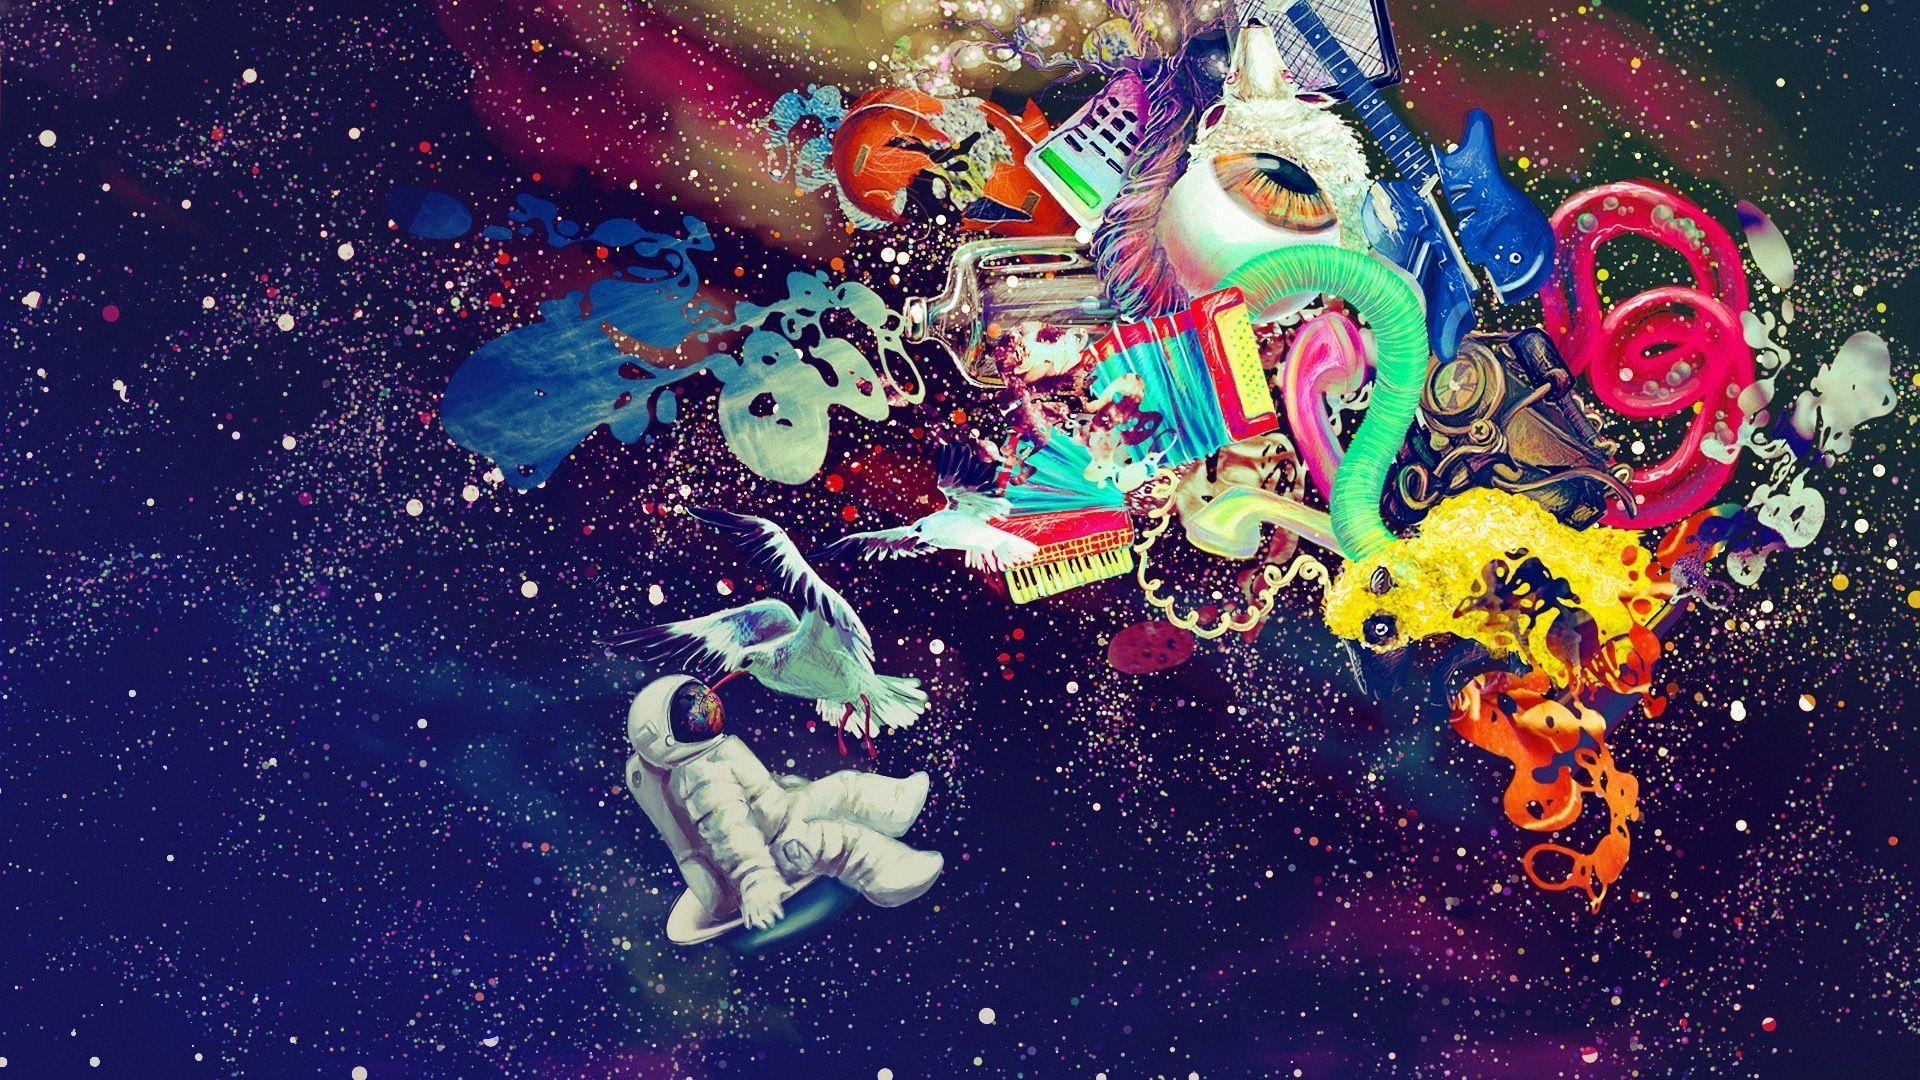 Trippy Wallpaper Tumblr